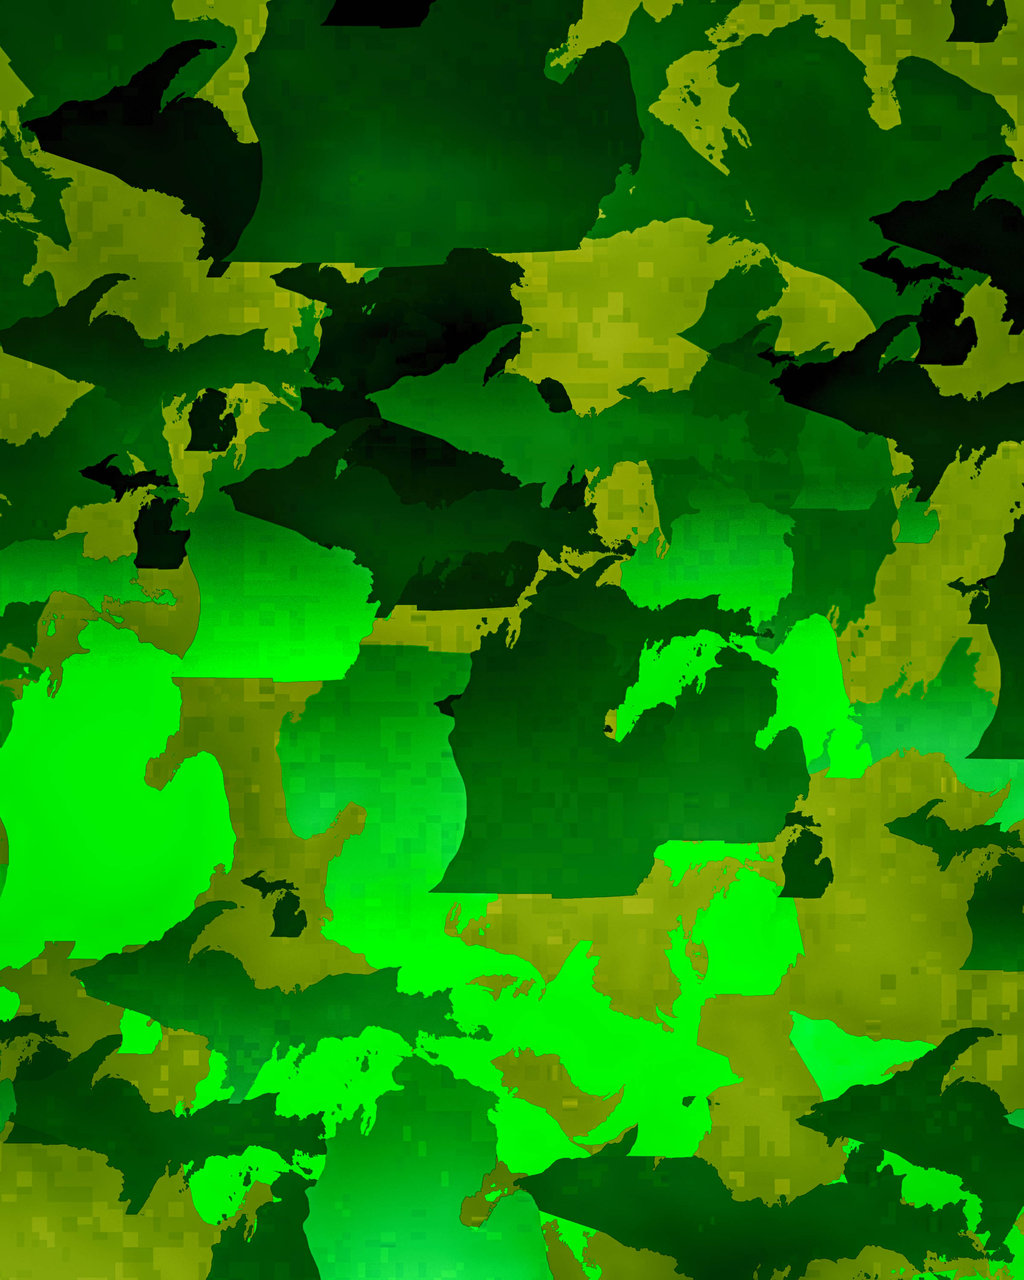 Camo Iphone Wallpaper Michigan camo by rowlee 1024x1280